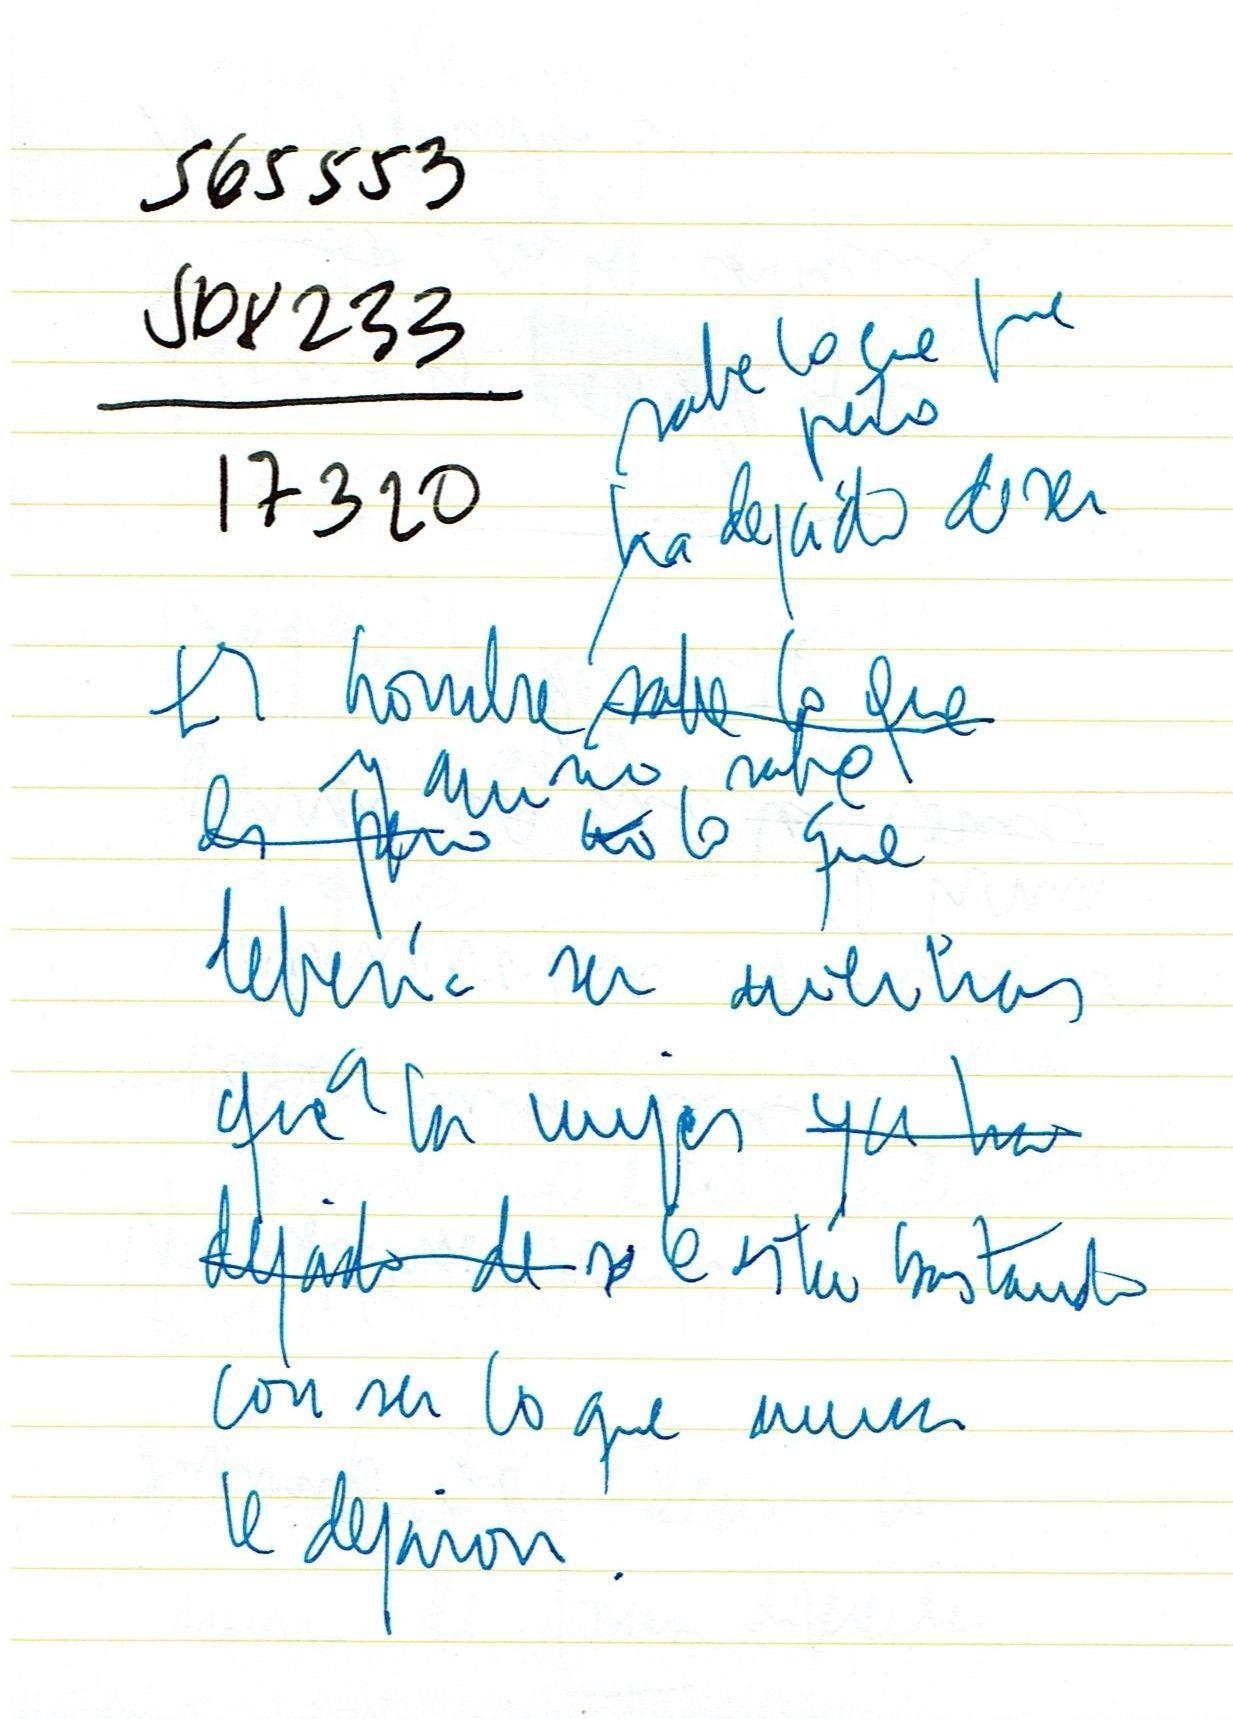 Texto manuscrito nº 30